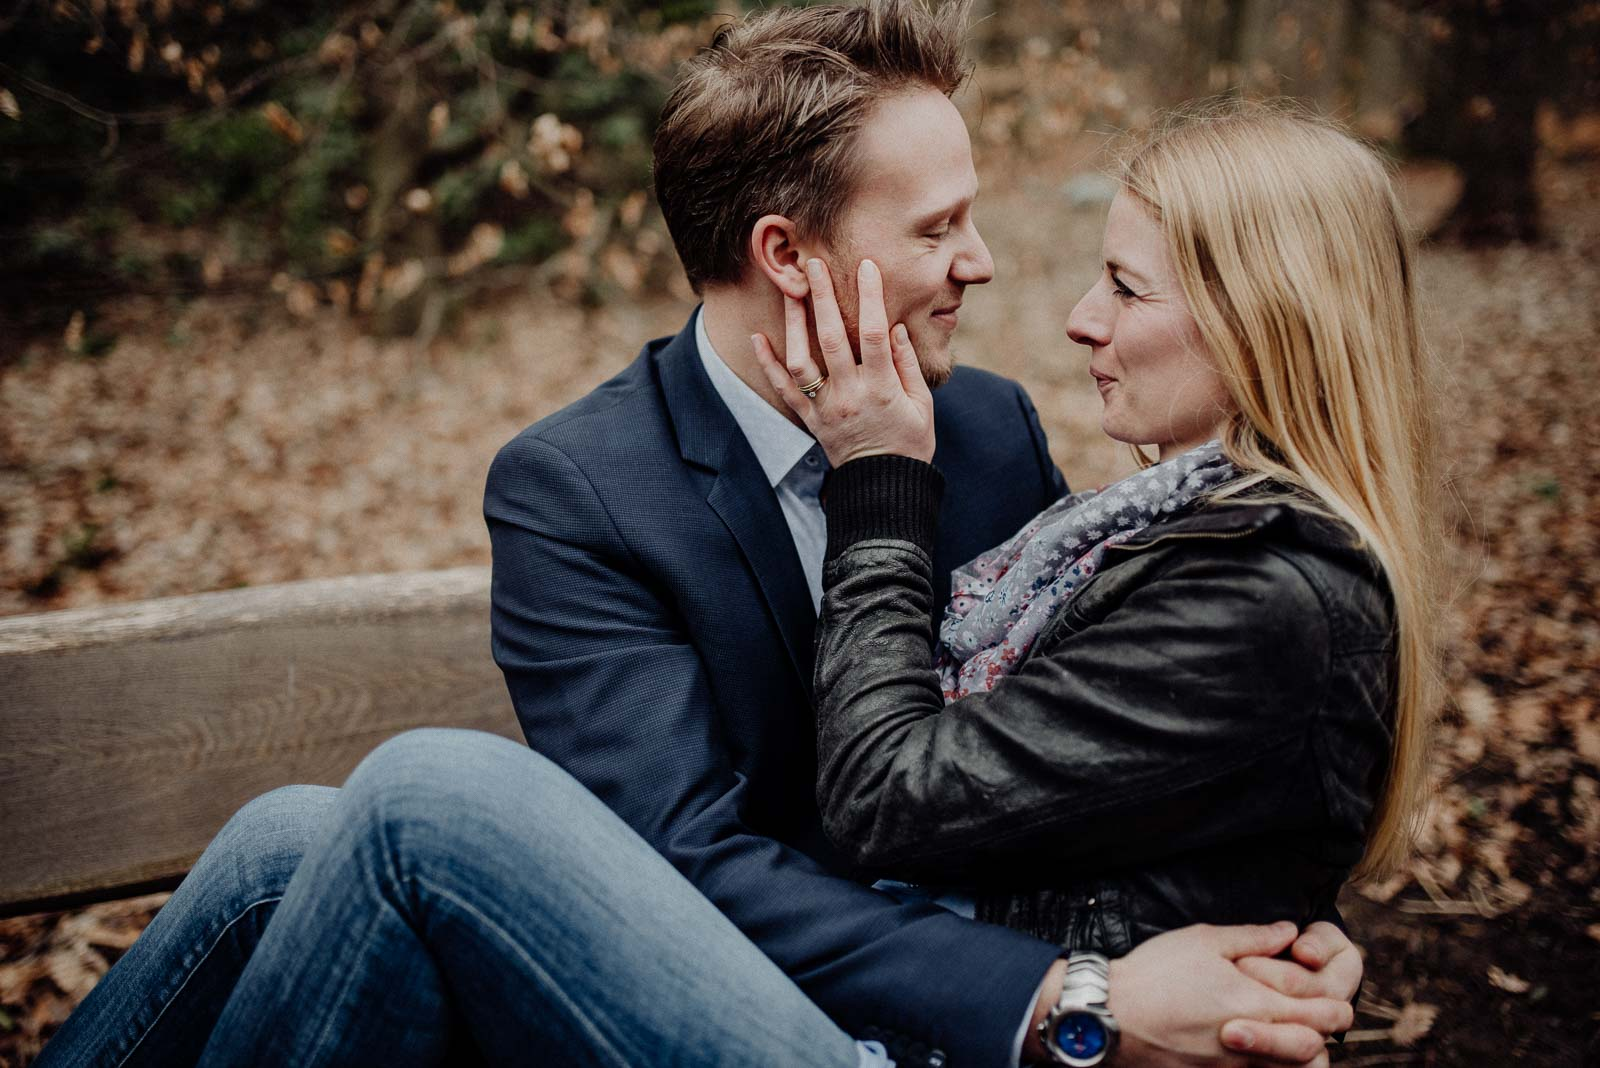 024-verlobungsshooting-engagement-fotograf-witten-rombergpark-dortmund